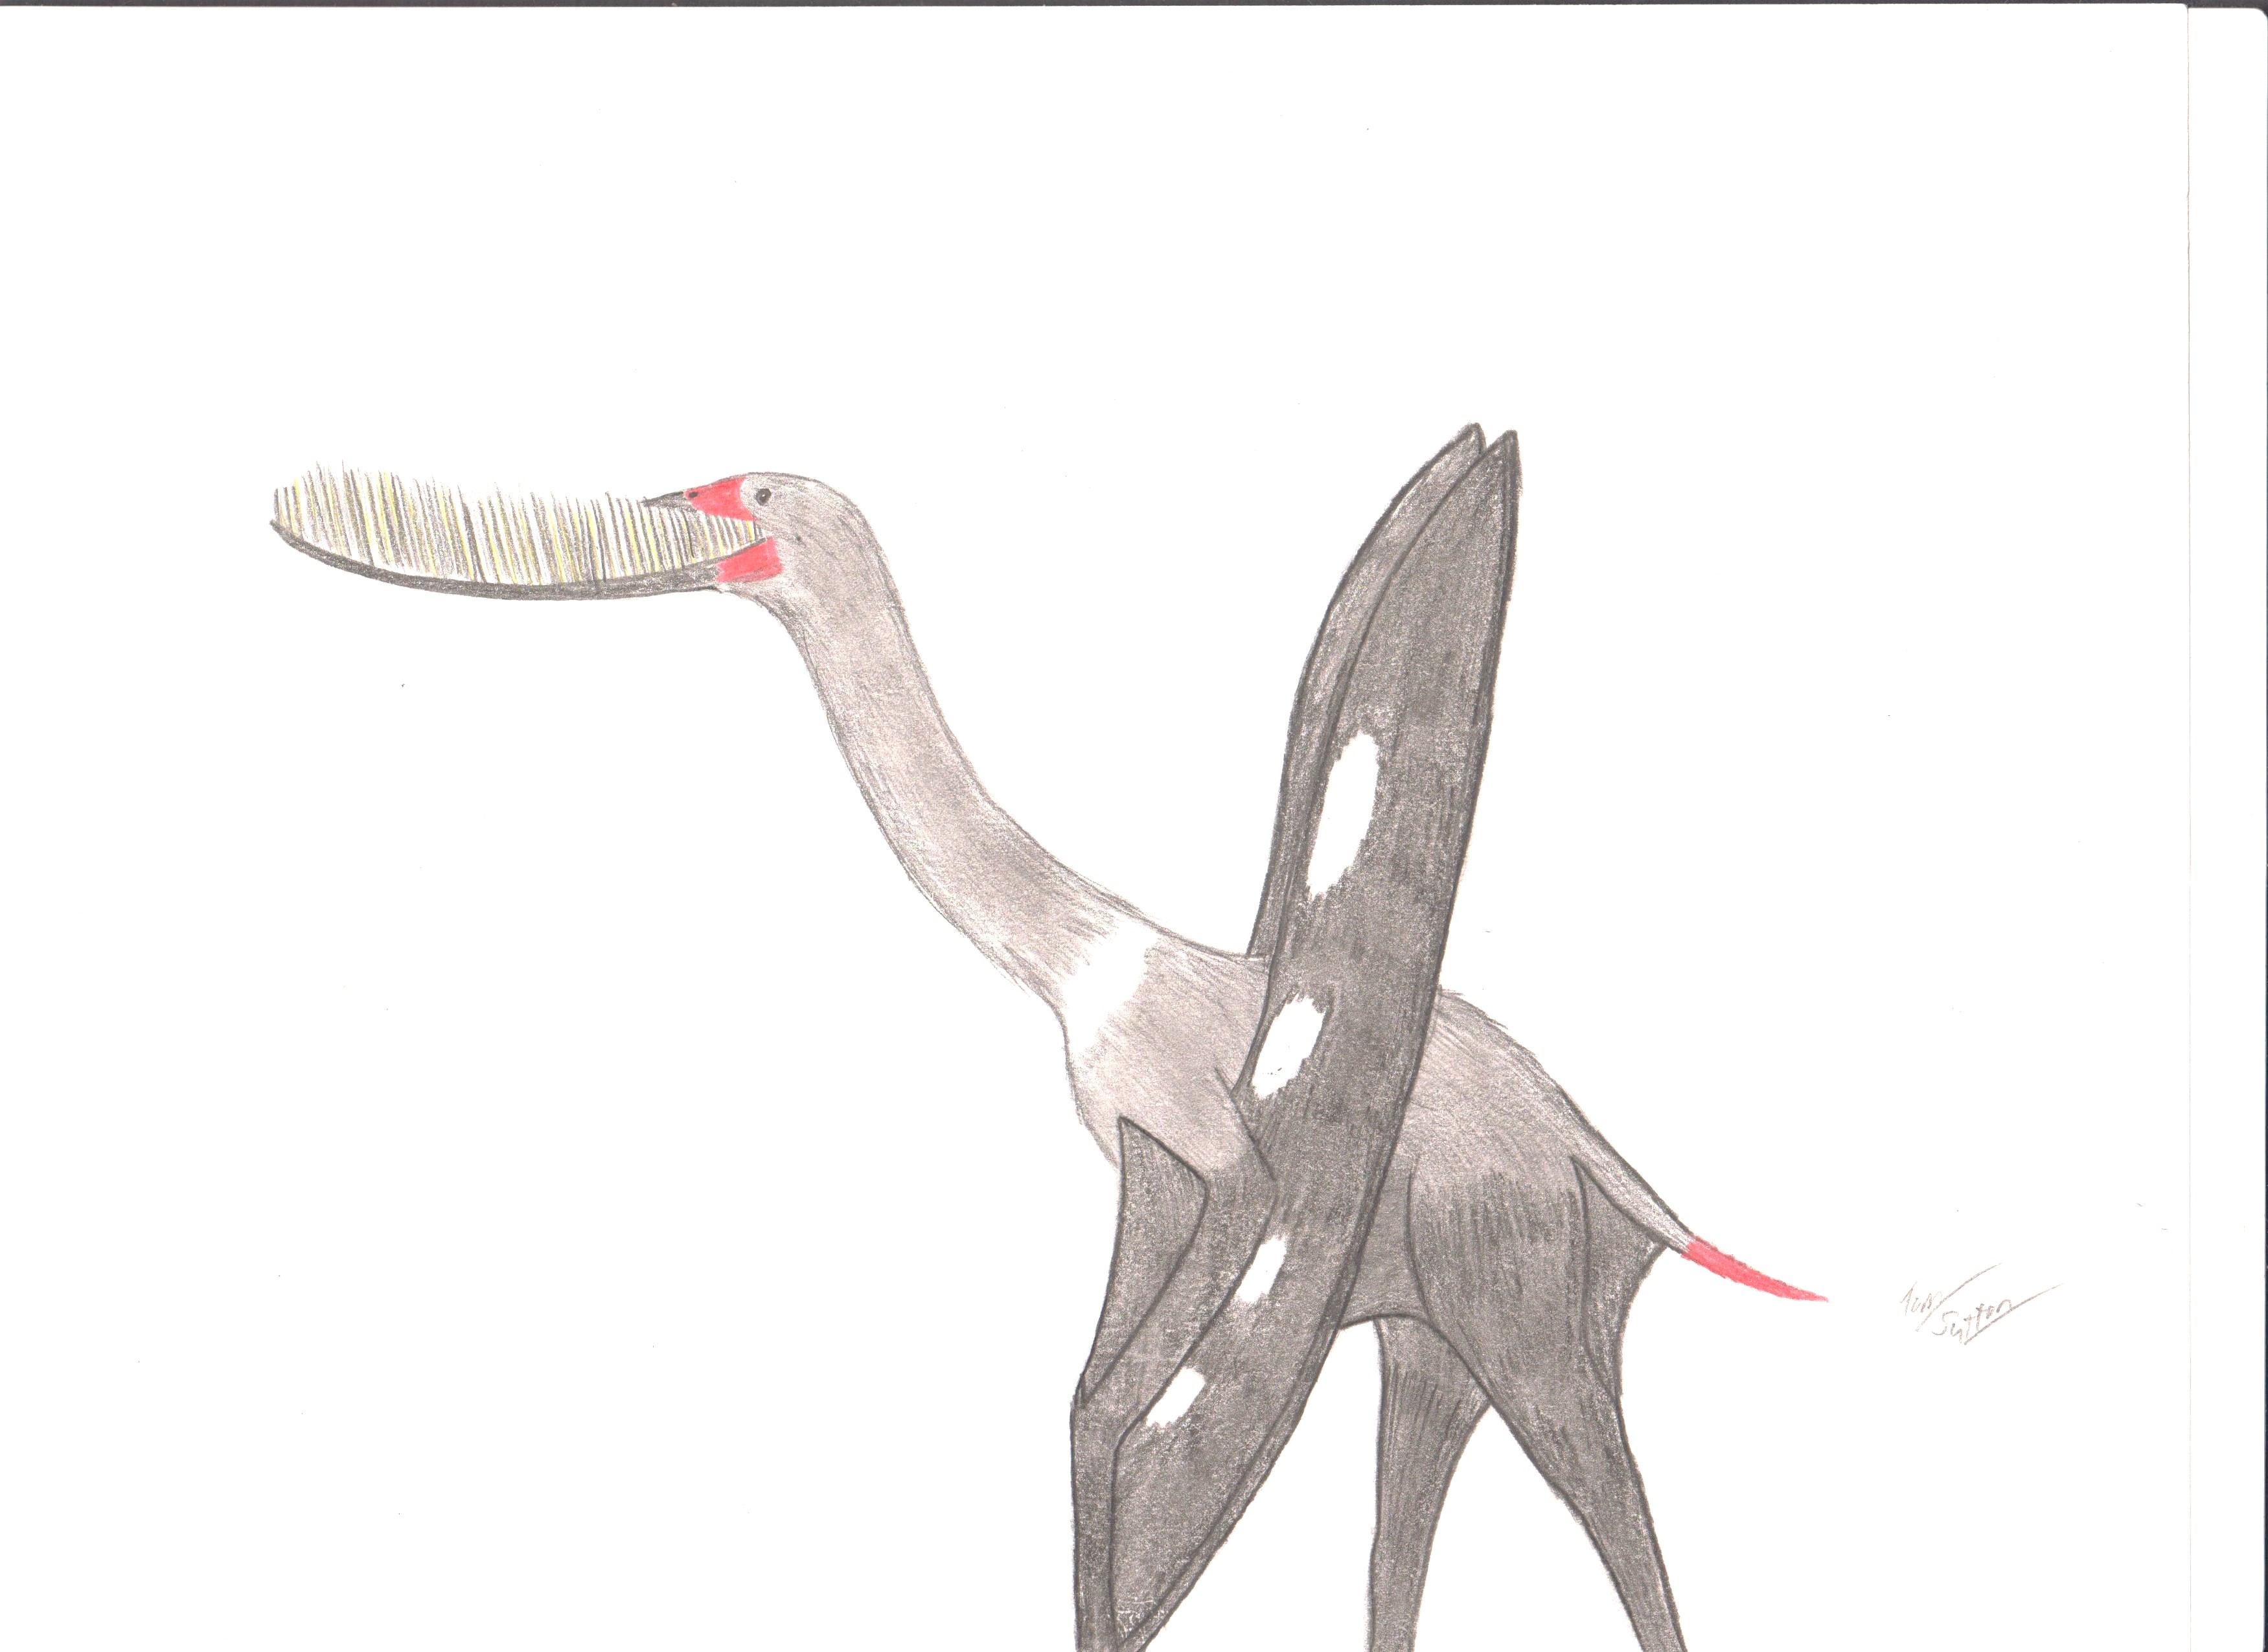 Pterodaustro guinazui by King-Edmarka